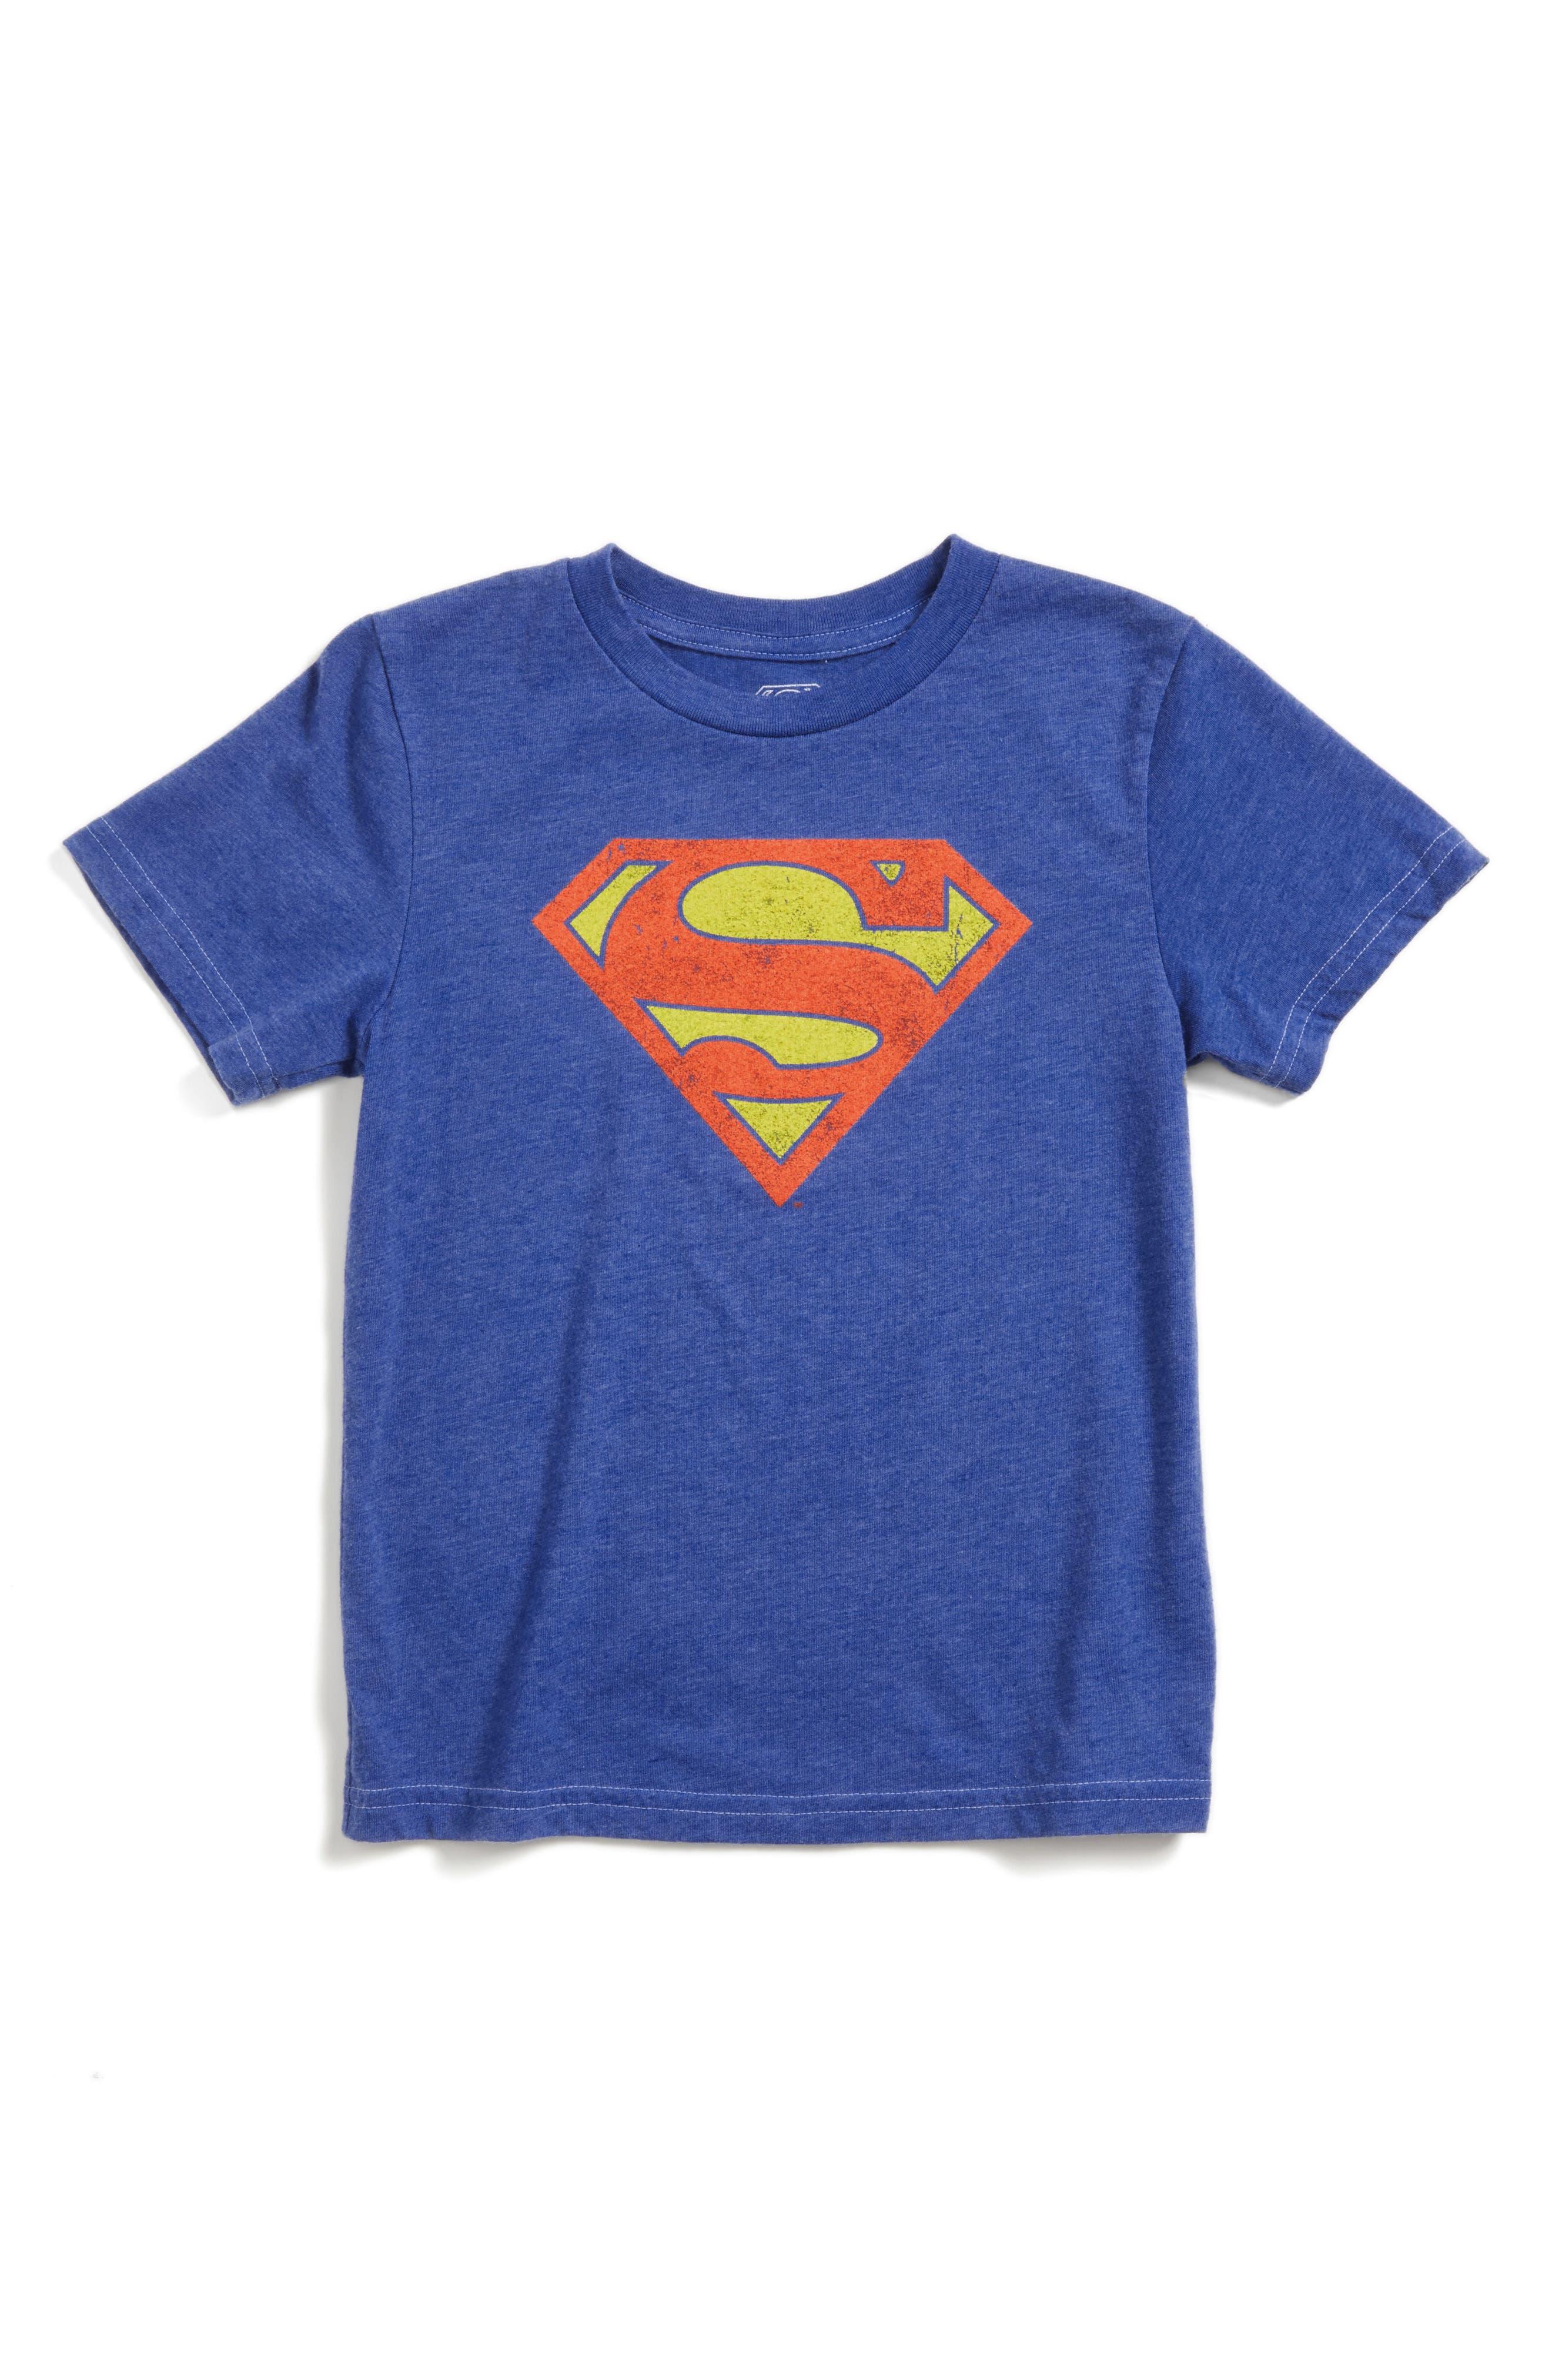 Alternate Image 1 Selected - Jem Superman Graphic T-Shirt (Toddler Boys, Little Boys & Big Boys)